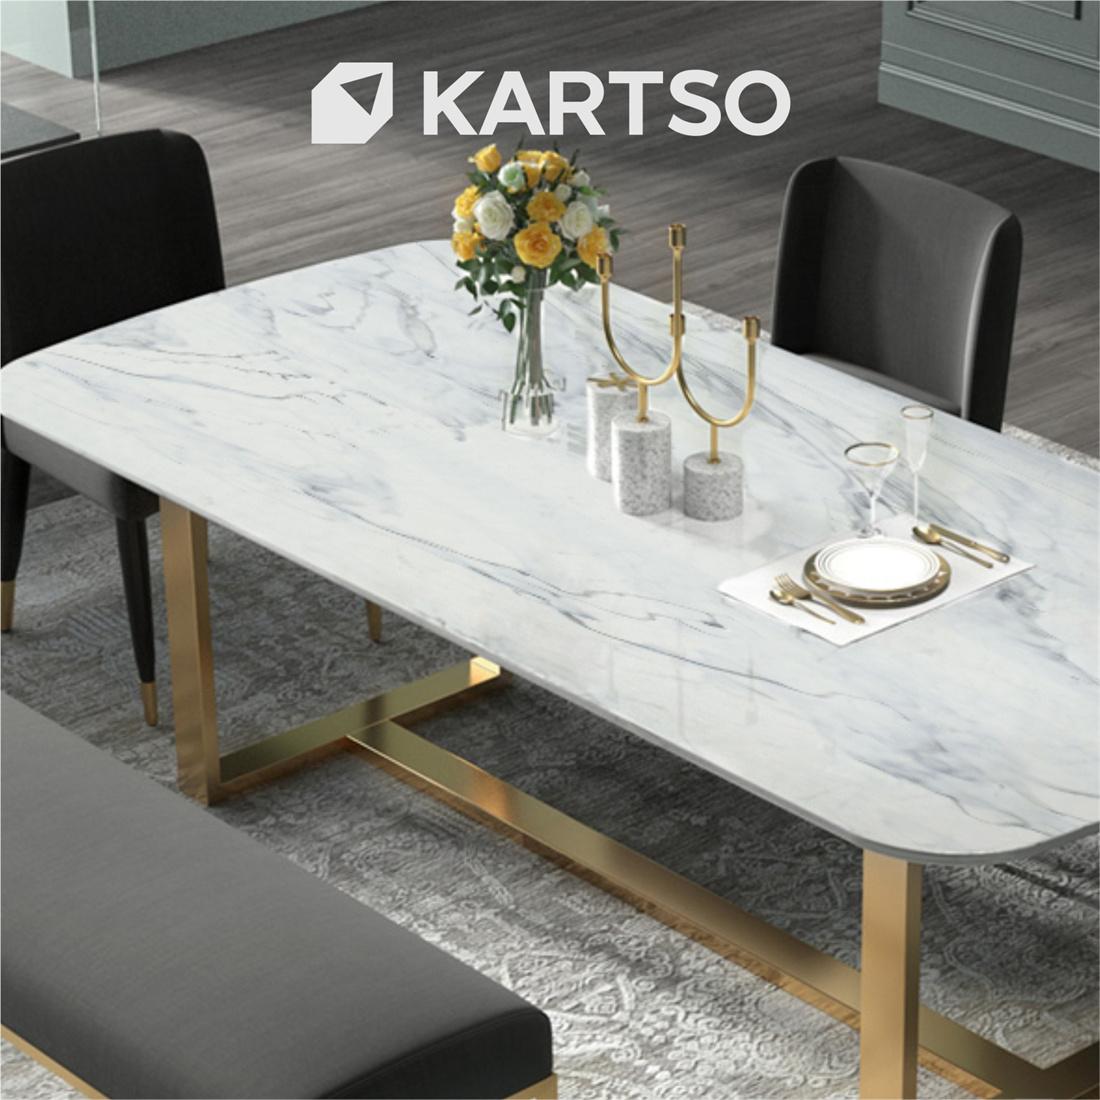 Kartso Calacatta  Nano Crystallized Glass Stone Slab For table top